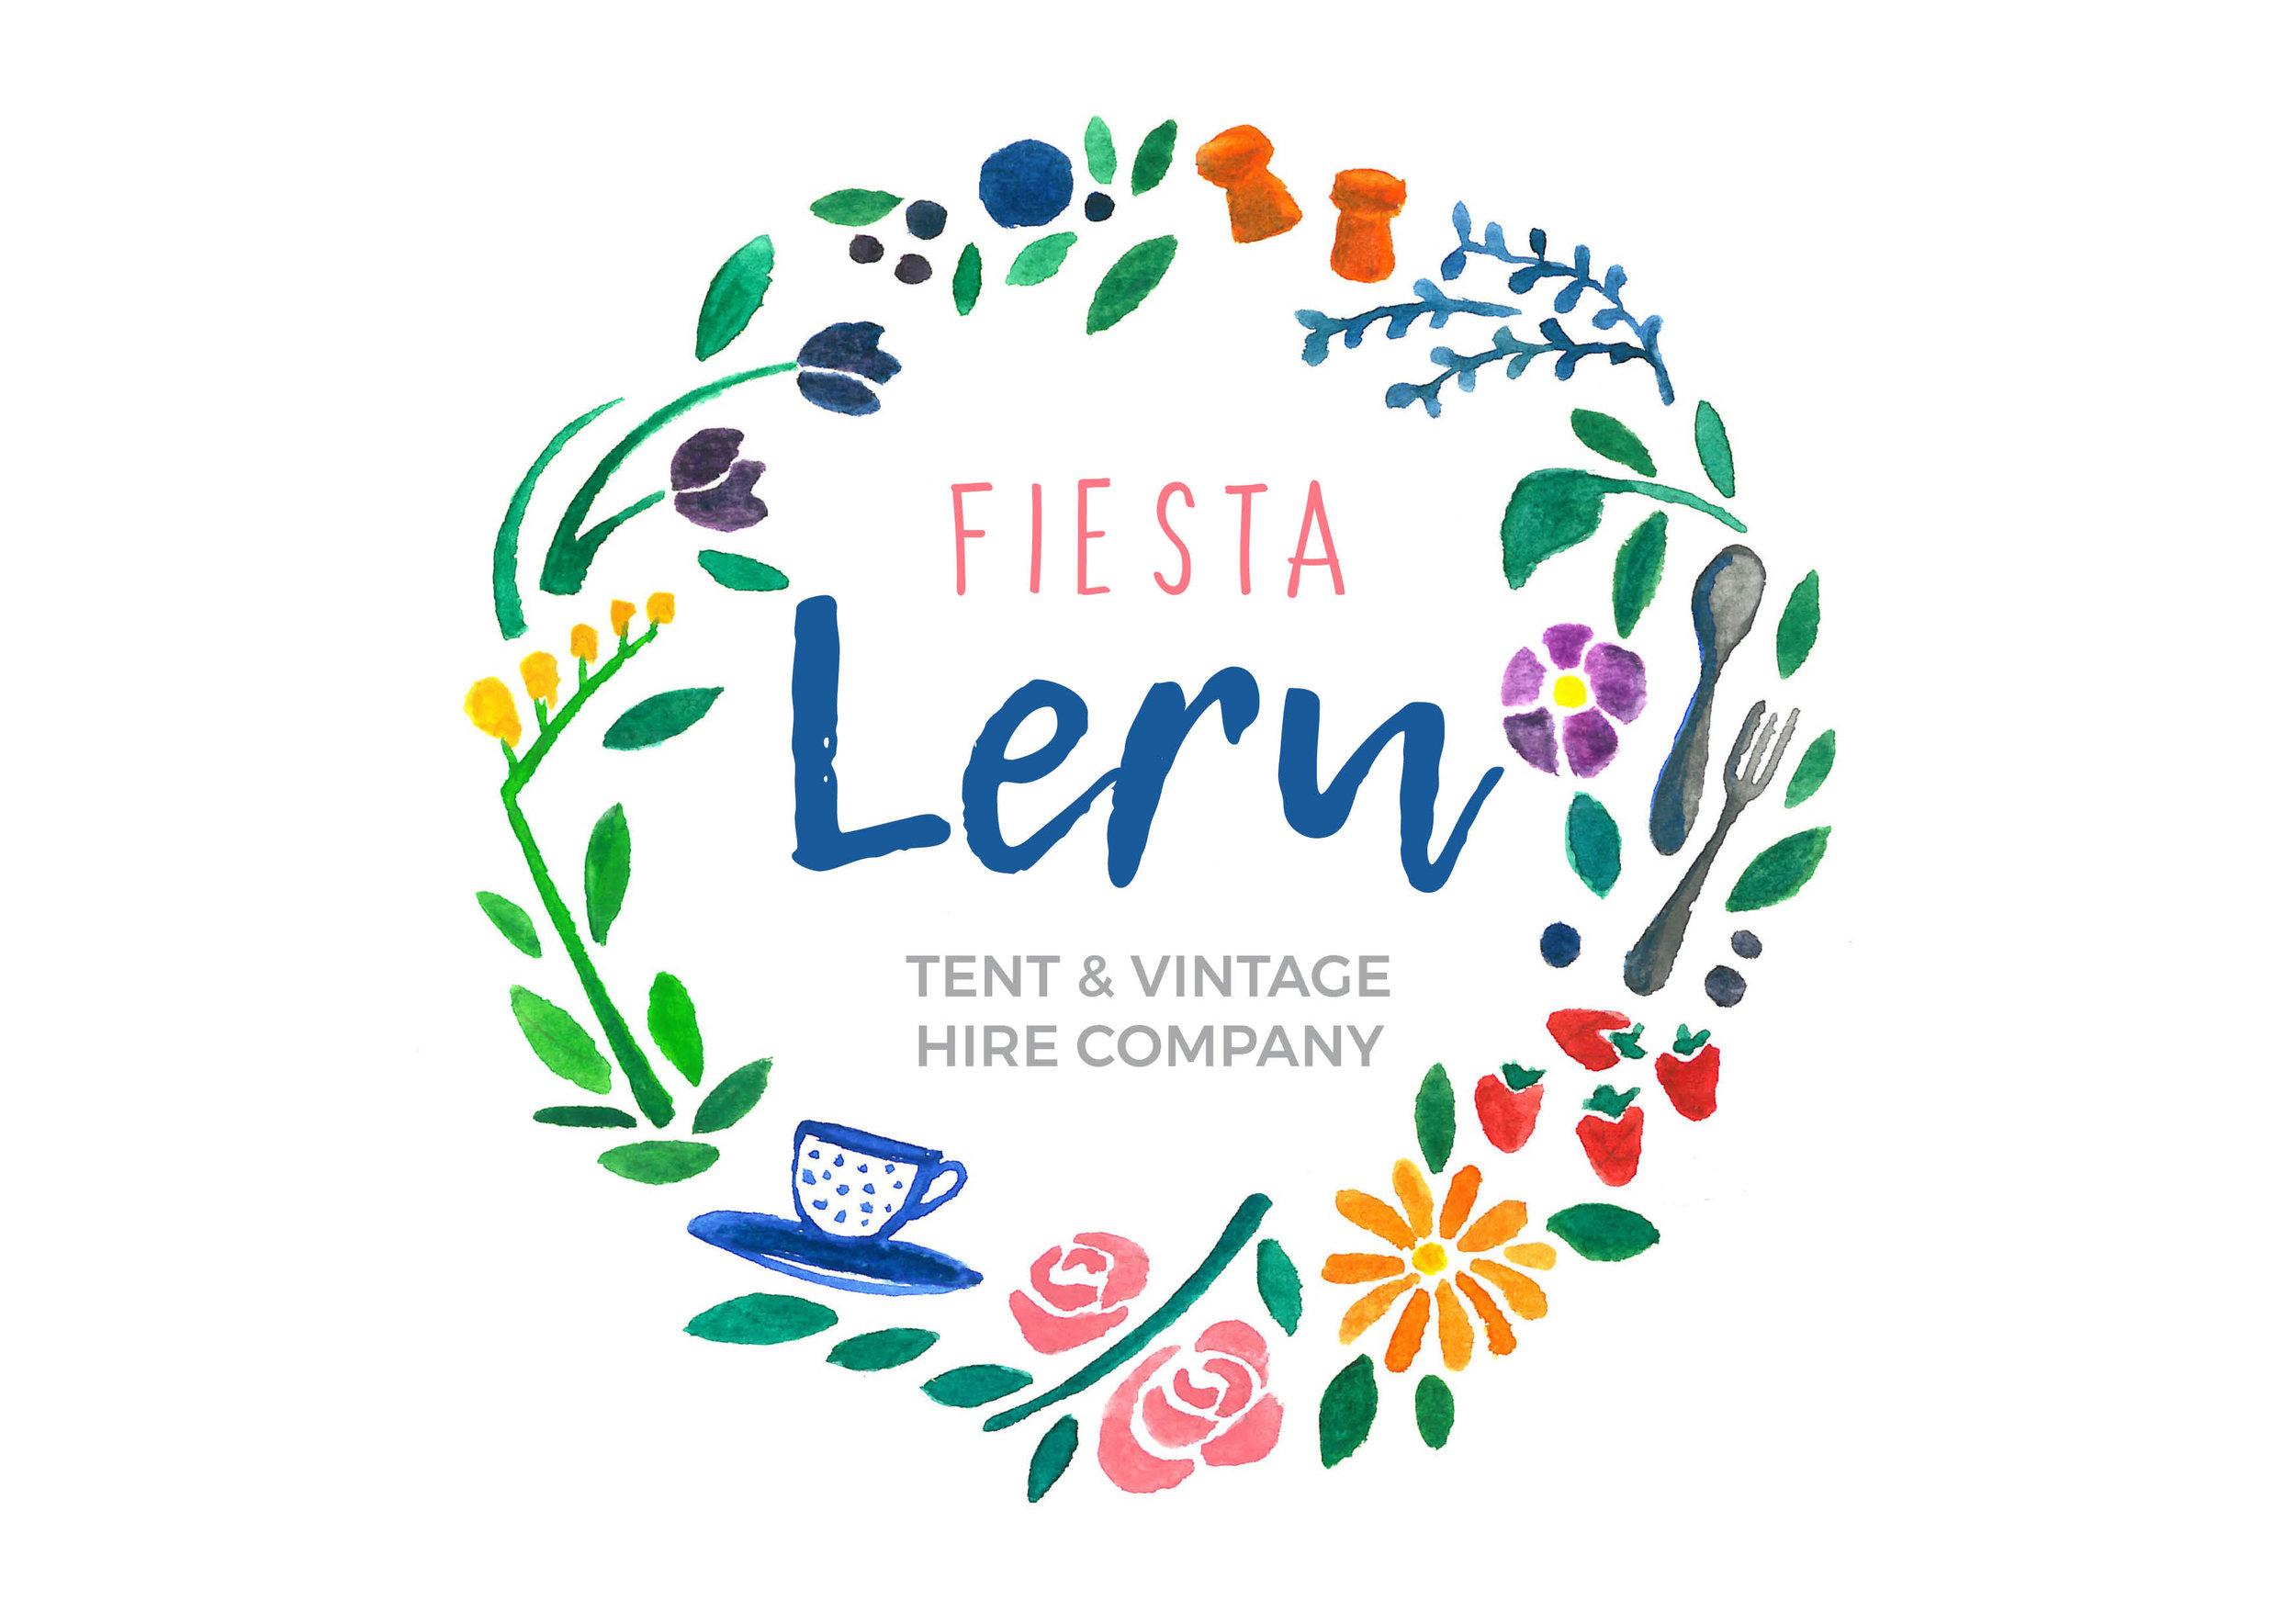 Fiesta Leru Tent & Vintage Hire Company